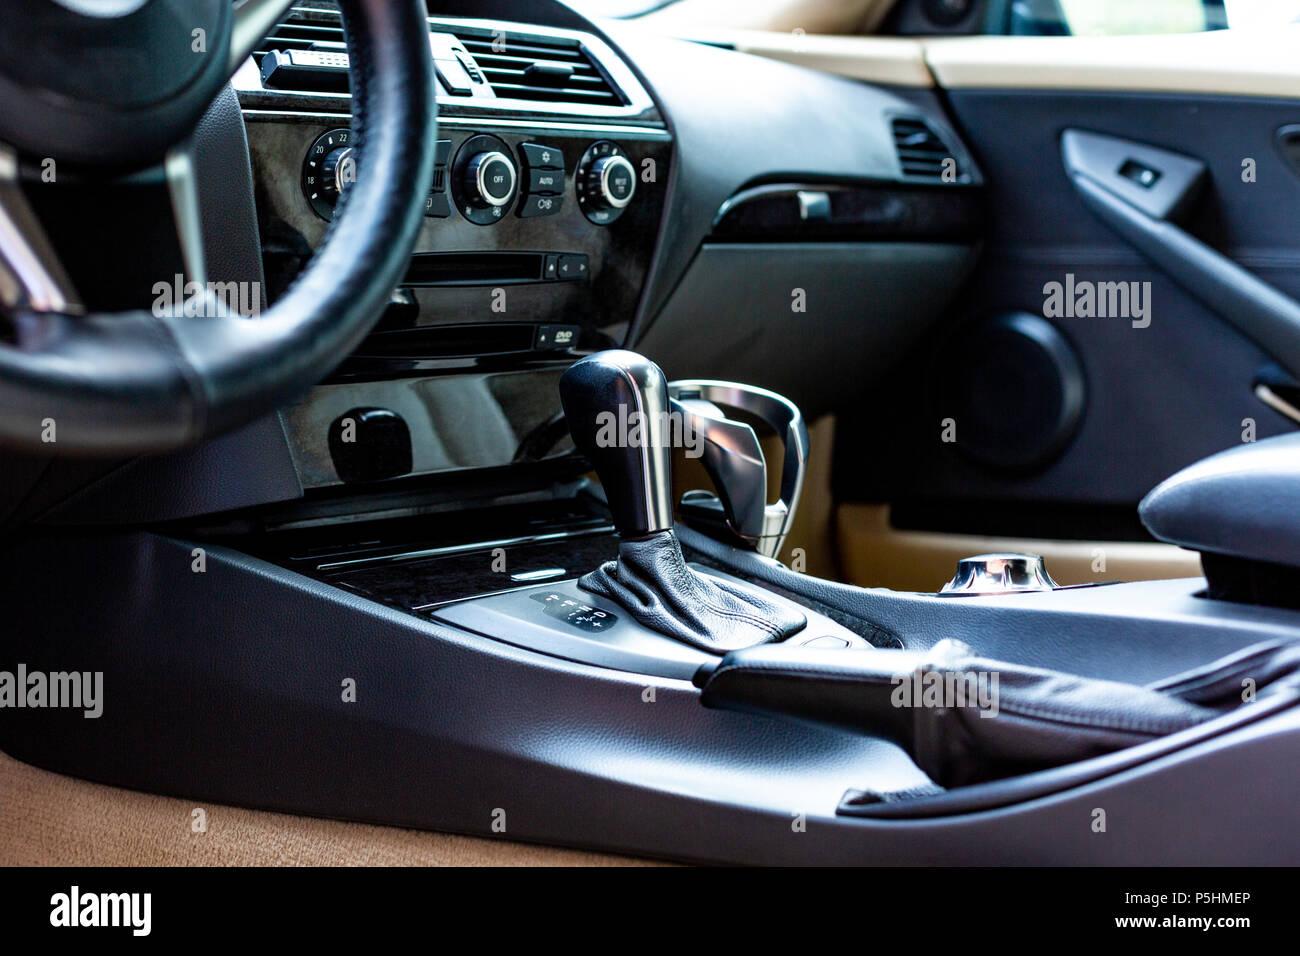 Luxurious Car Dashboard Stock Photos Luxurious Car Dashboard Stock